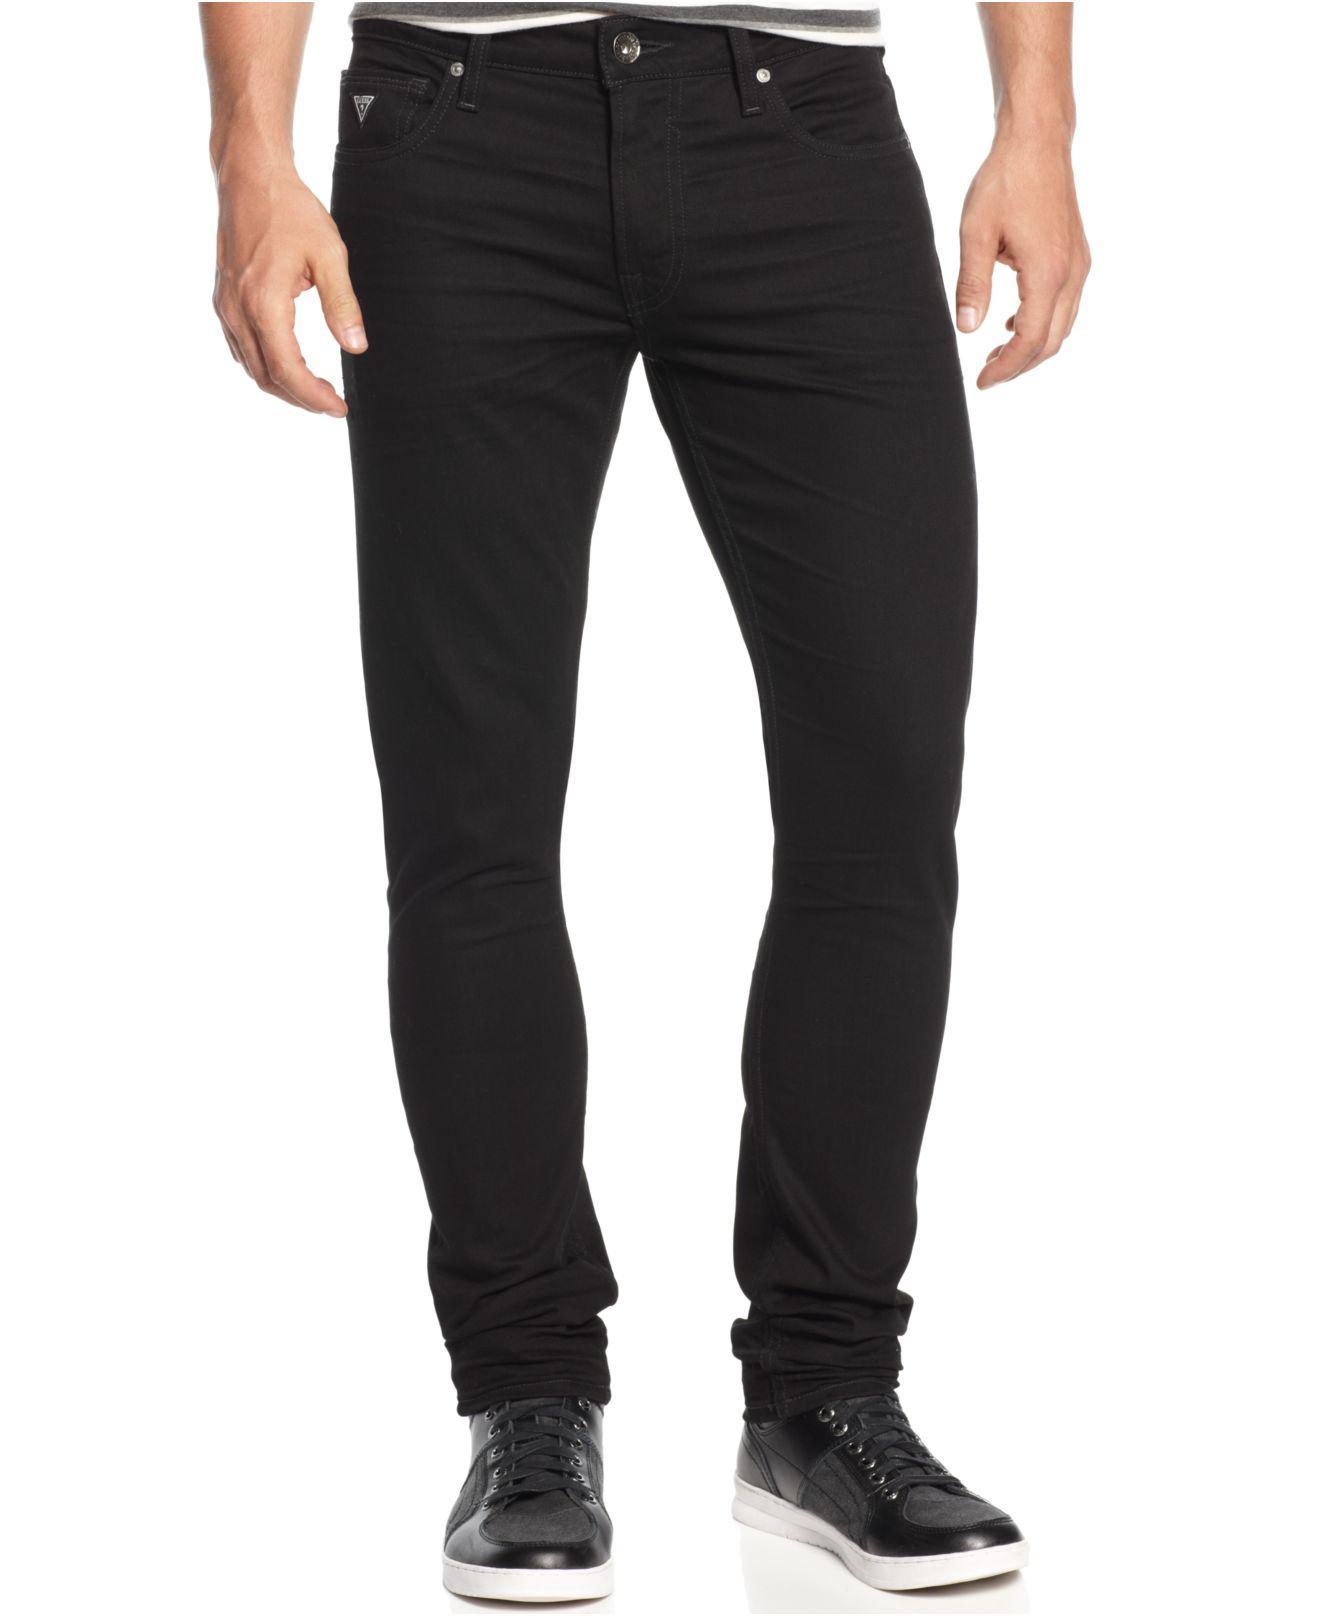 93cde5d0a69 Lyst - Guess Jailbreak-wash Skinny Jeans in Black for Men